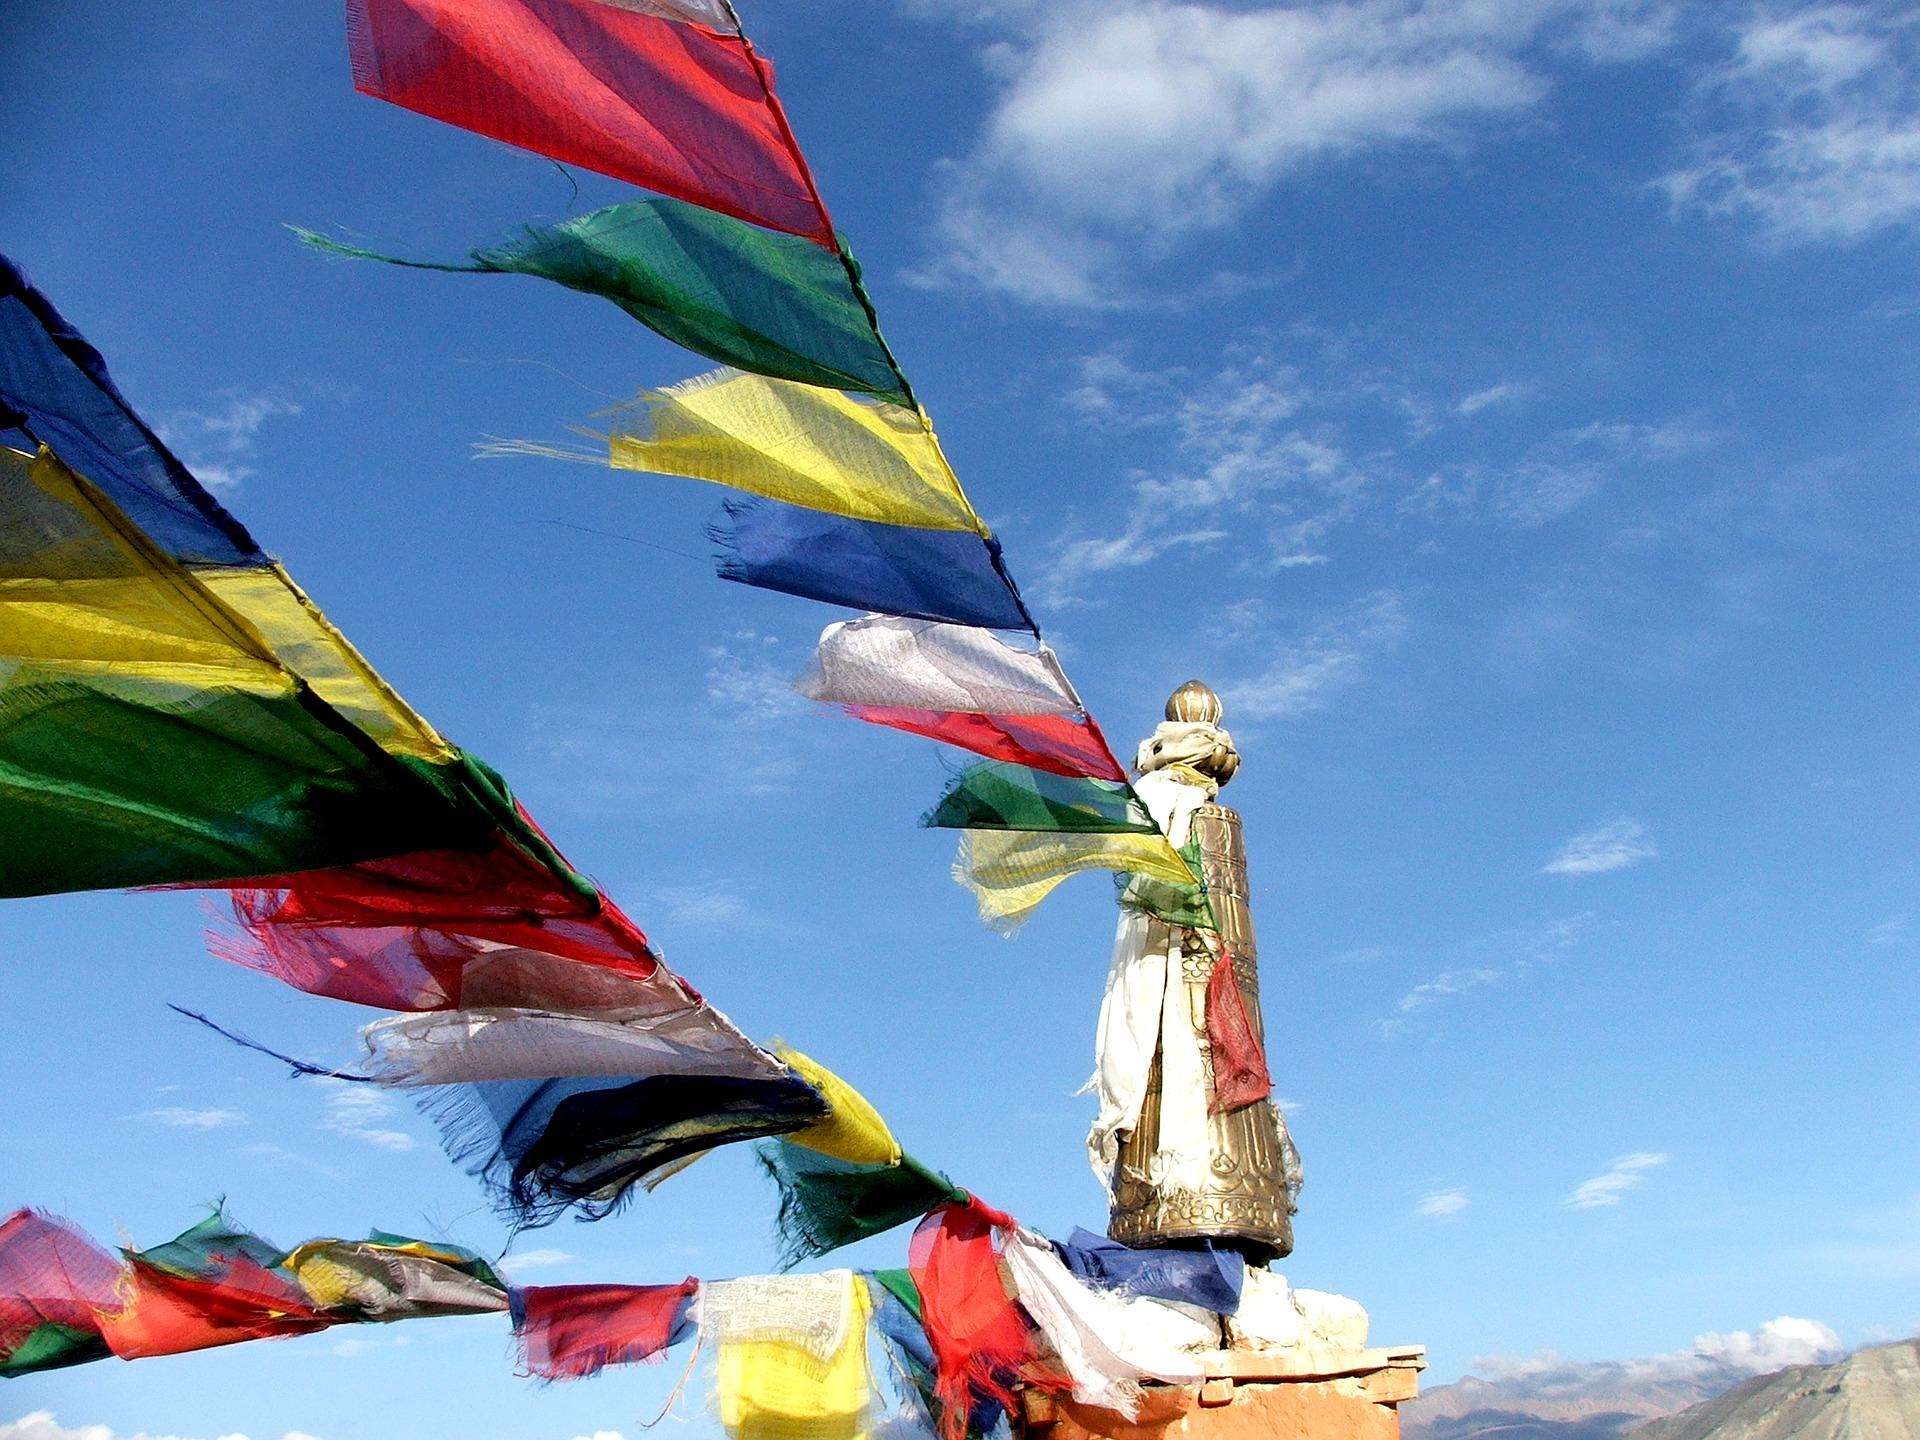 18 Day Himalayan Upper Mustang Trek Wellness & Culinary Adventure